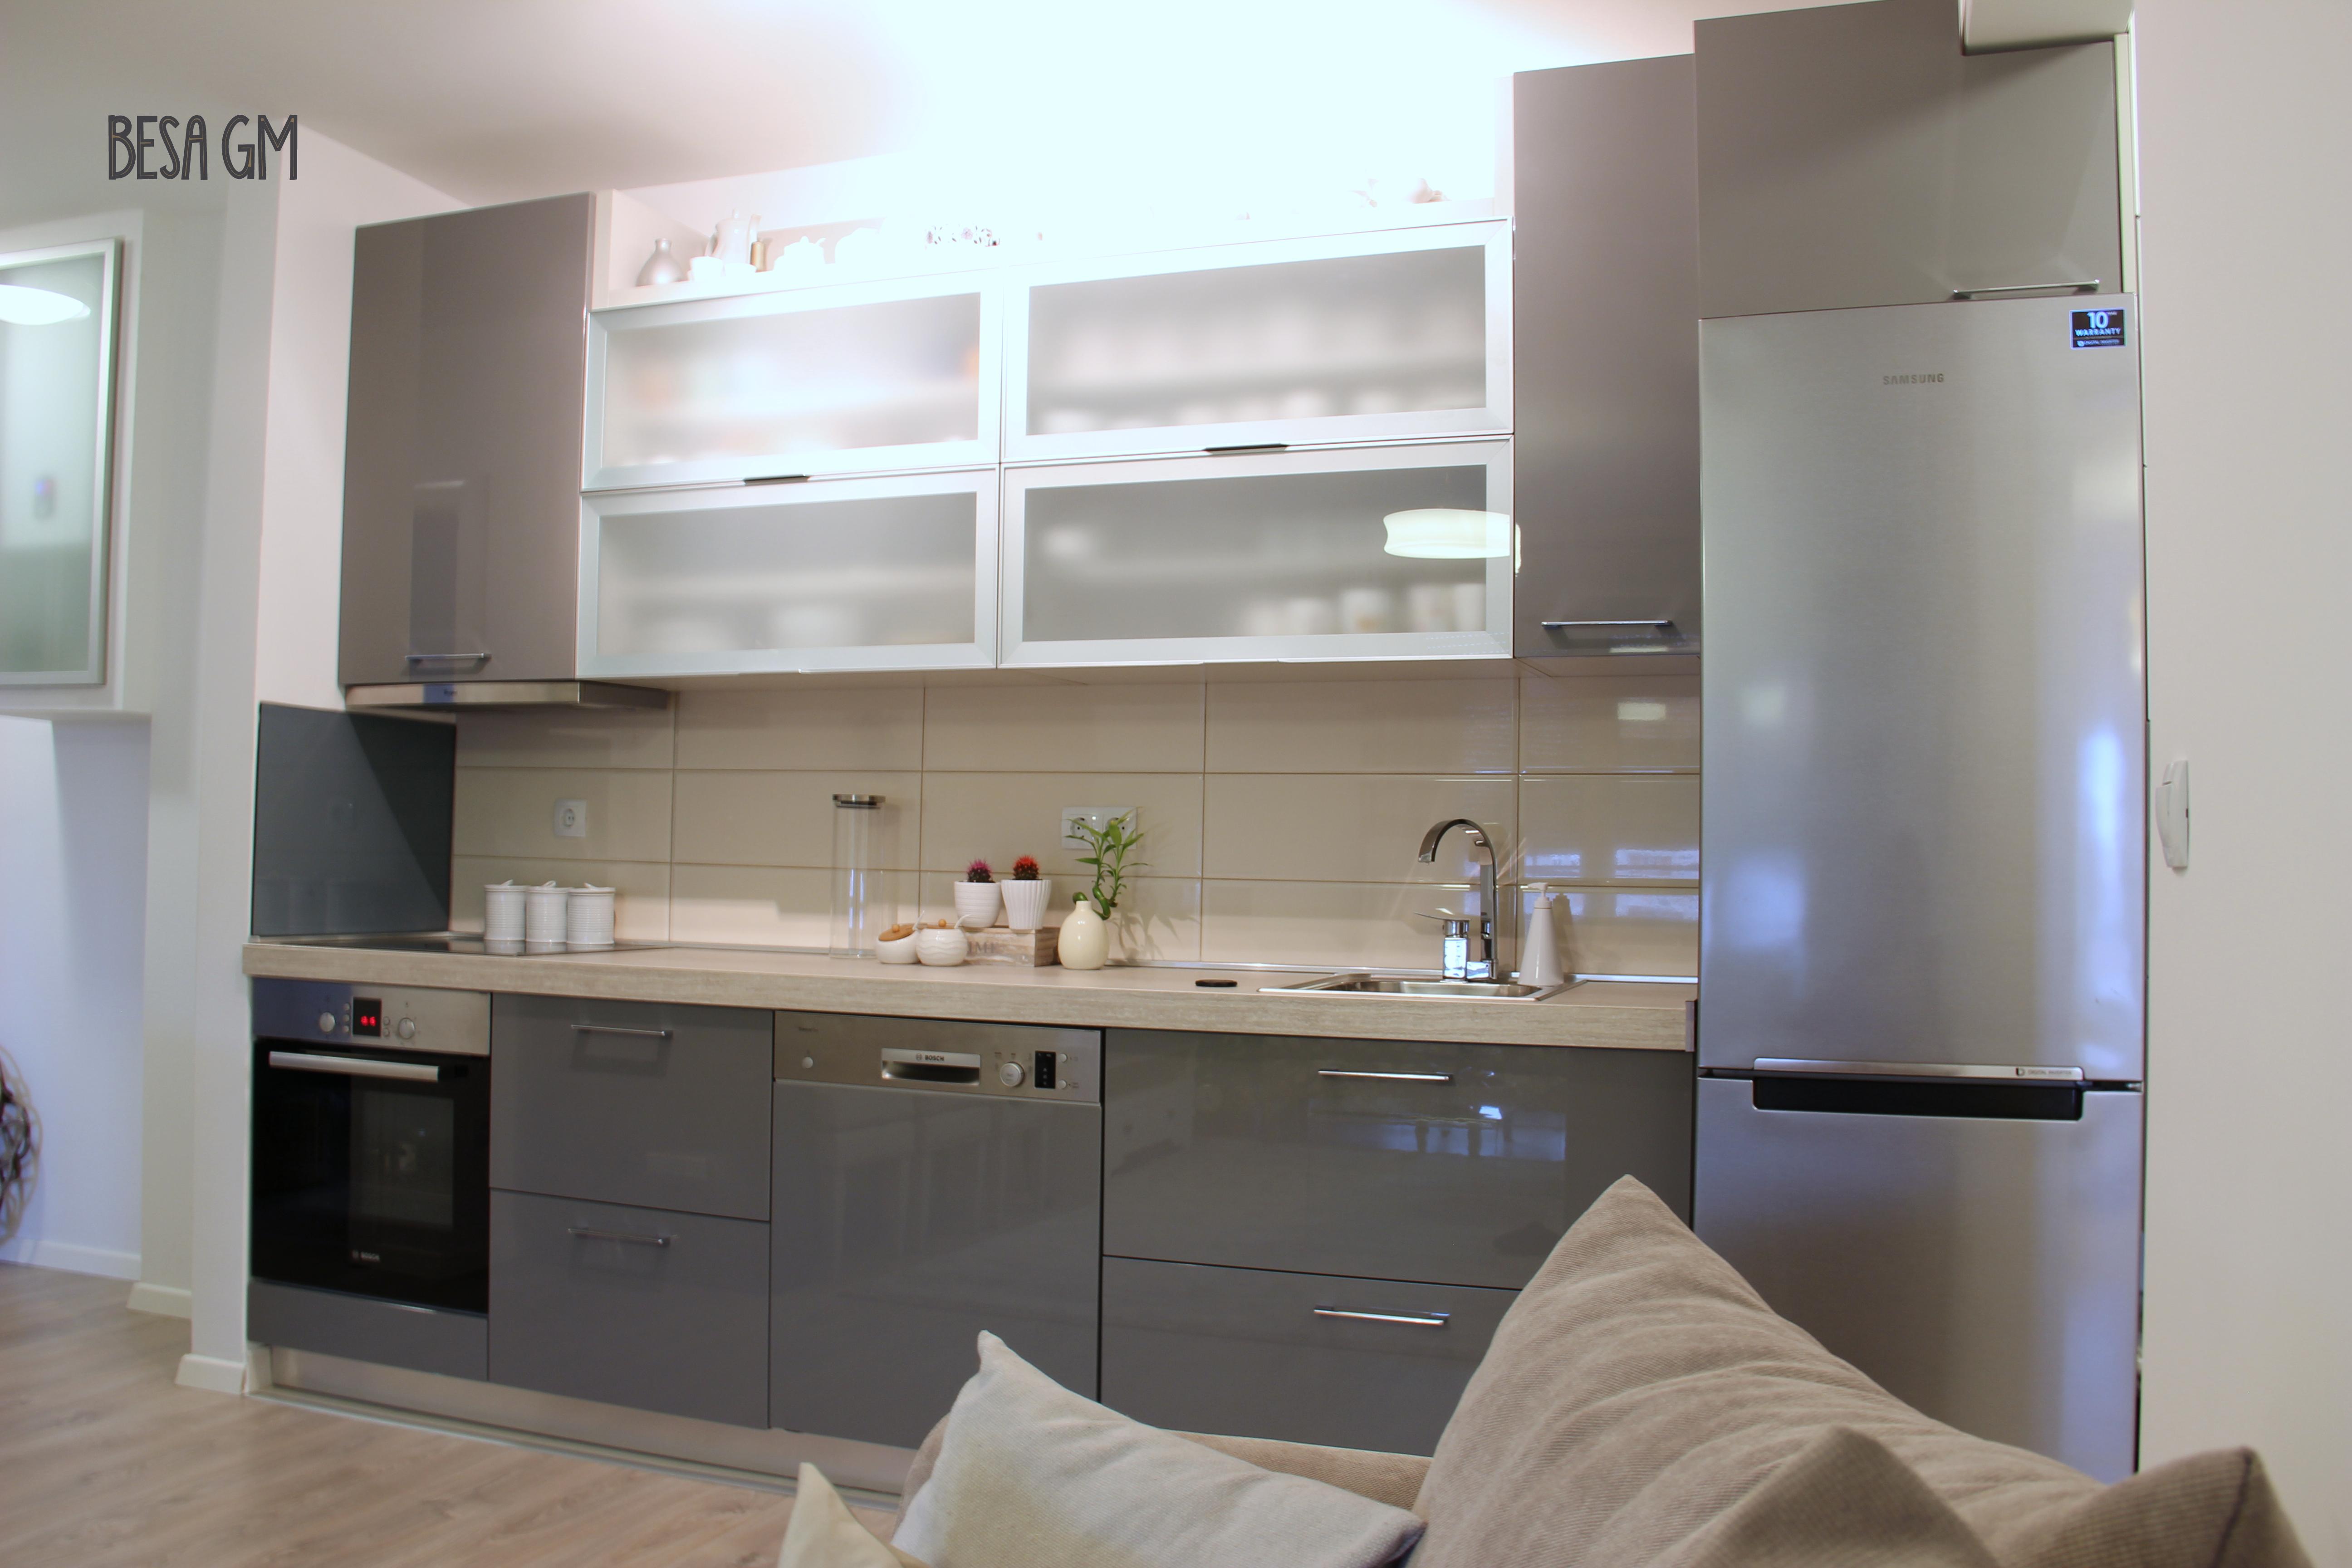 Laminate For Kitchen Cabinets Kitchen Cabinets Besa Gm